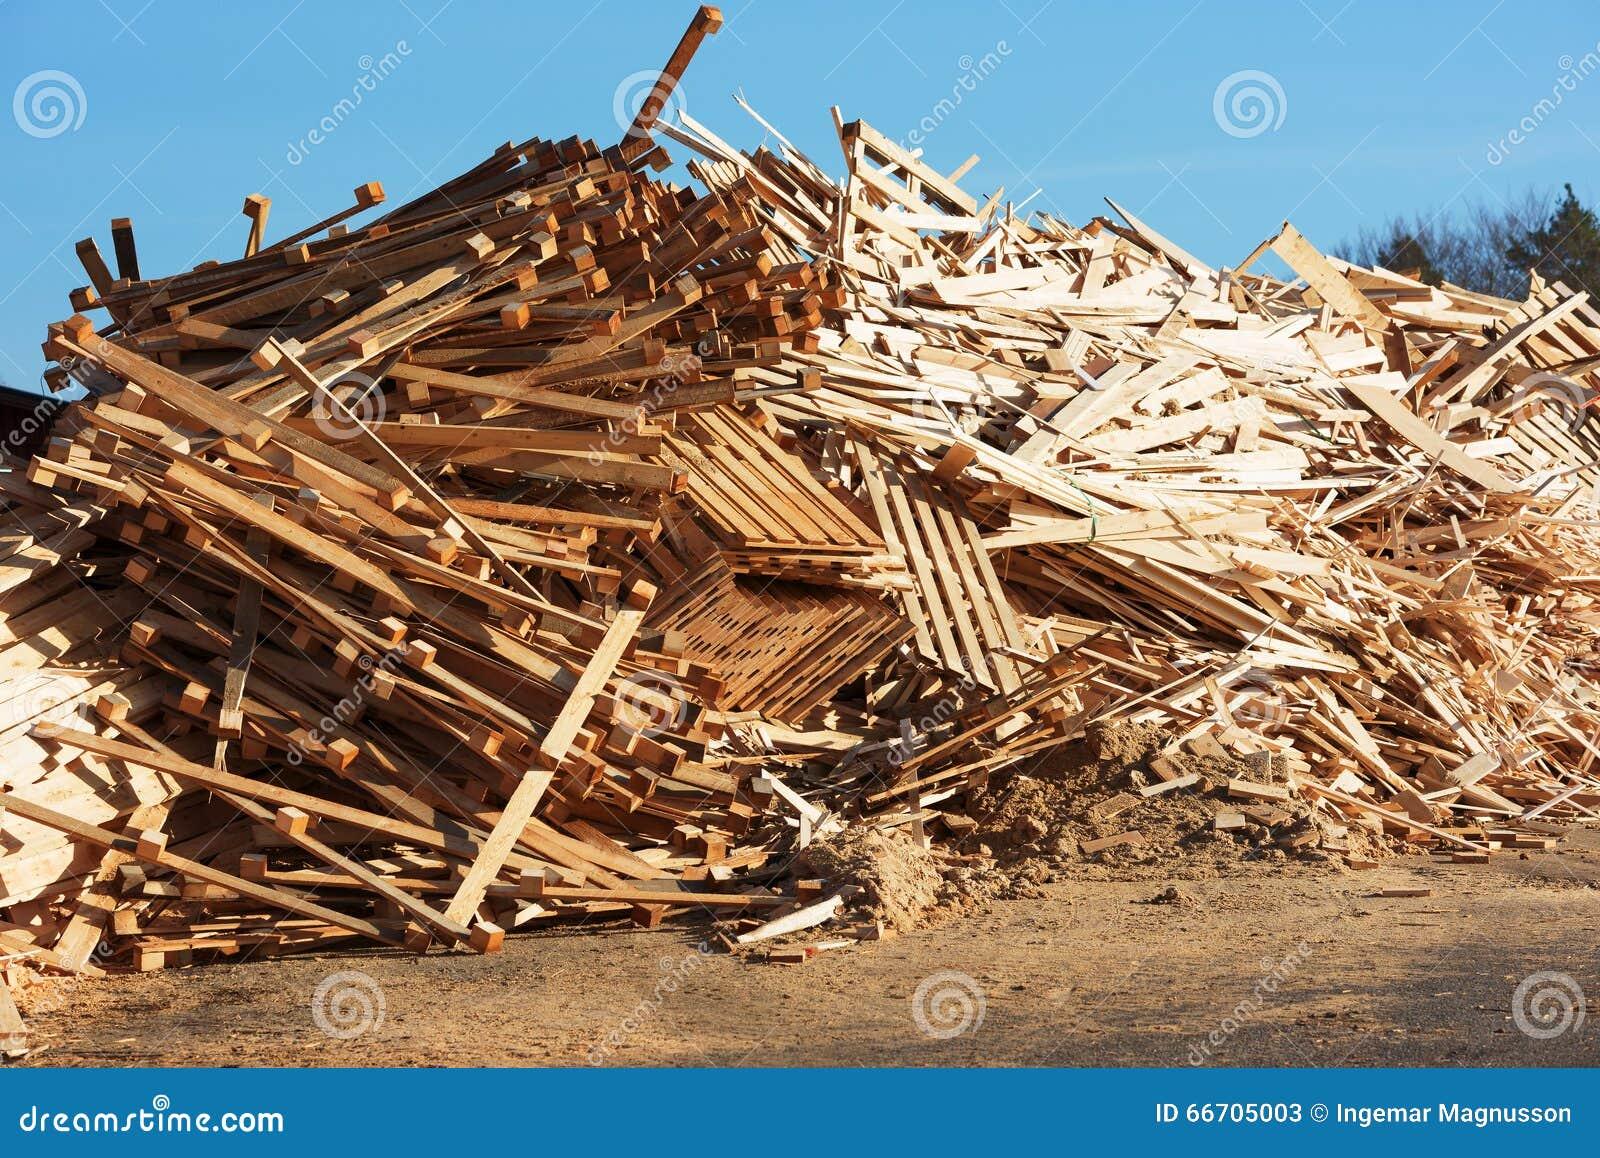 Wooden Debris Stock Image Image Of Destroyed Storage 66705003